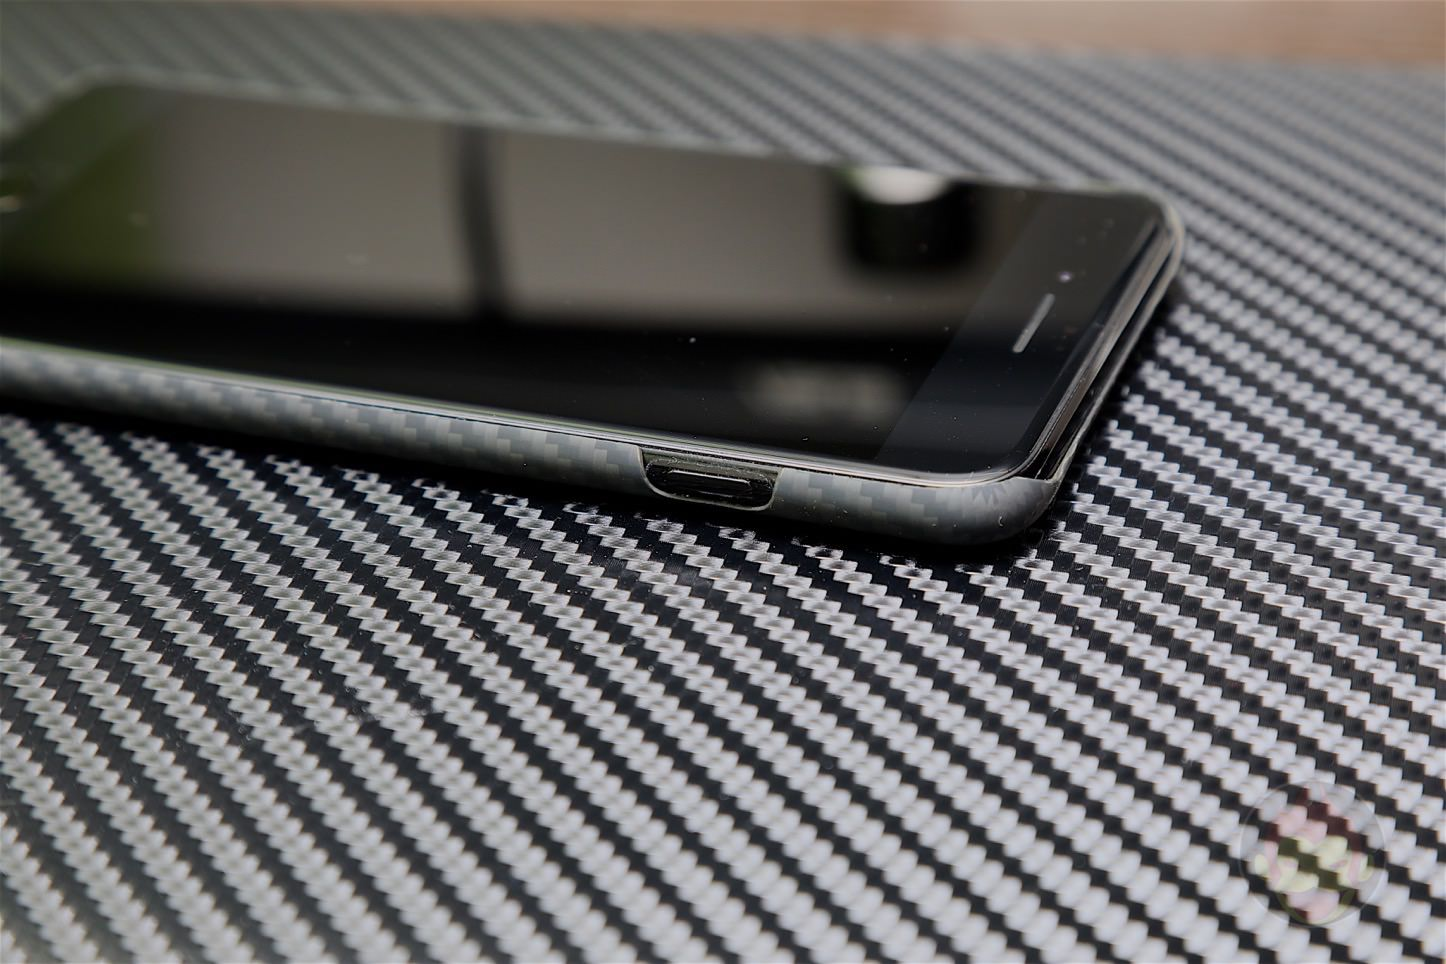 Pitaka iPhoneケース レビュー